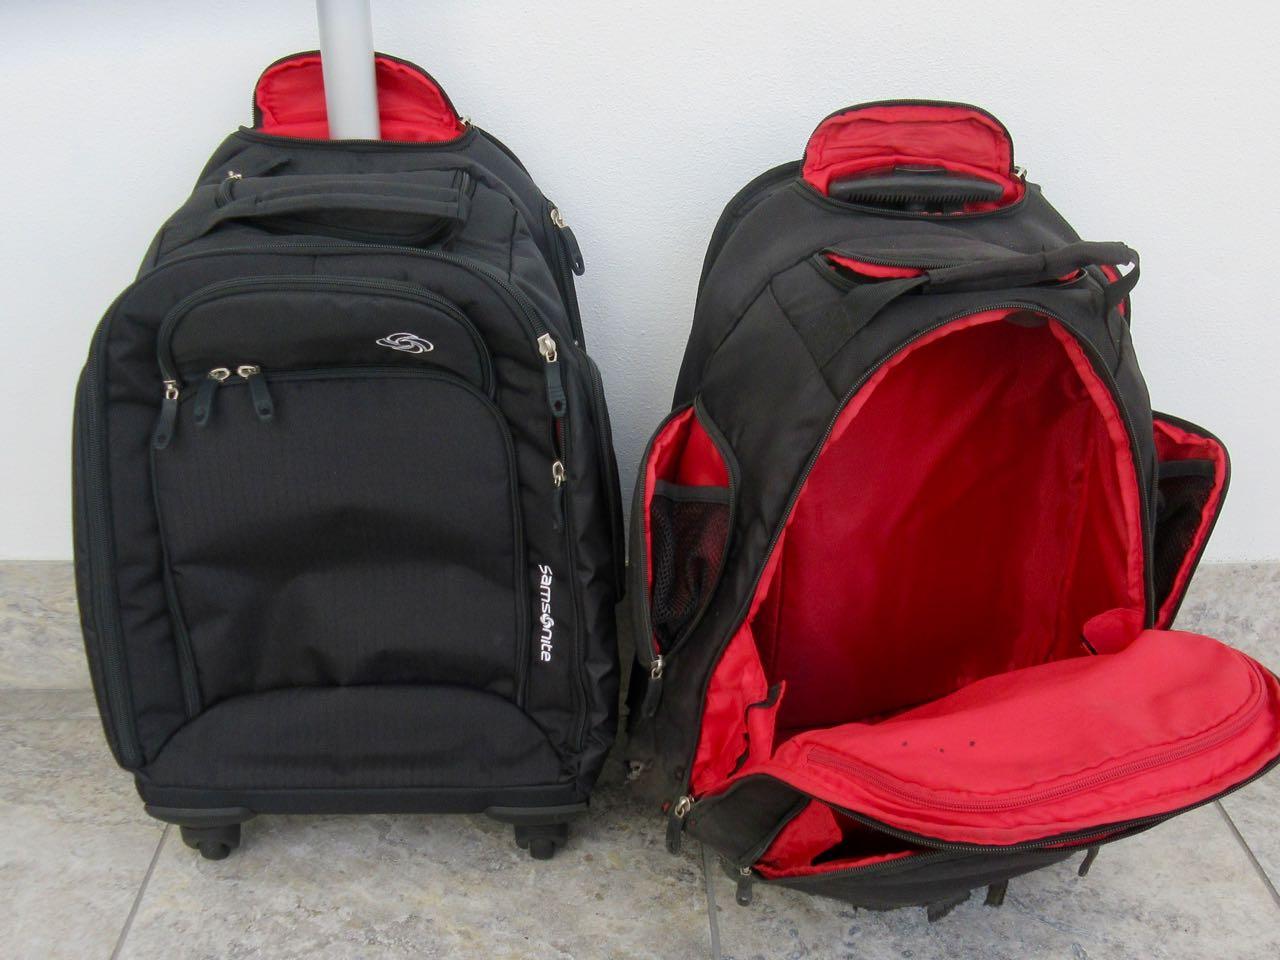 fce247b0ee8 Samsonite Laptop Backpack Price- Fenix Toulouse Handball